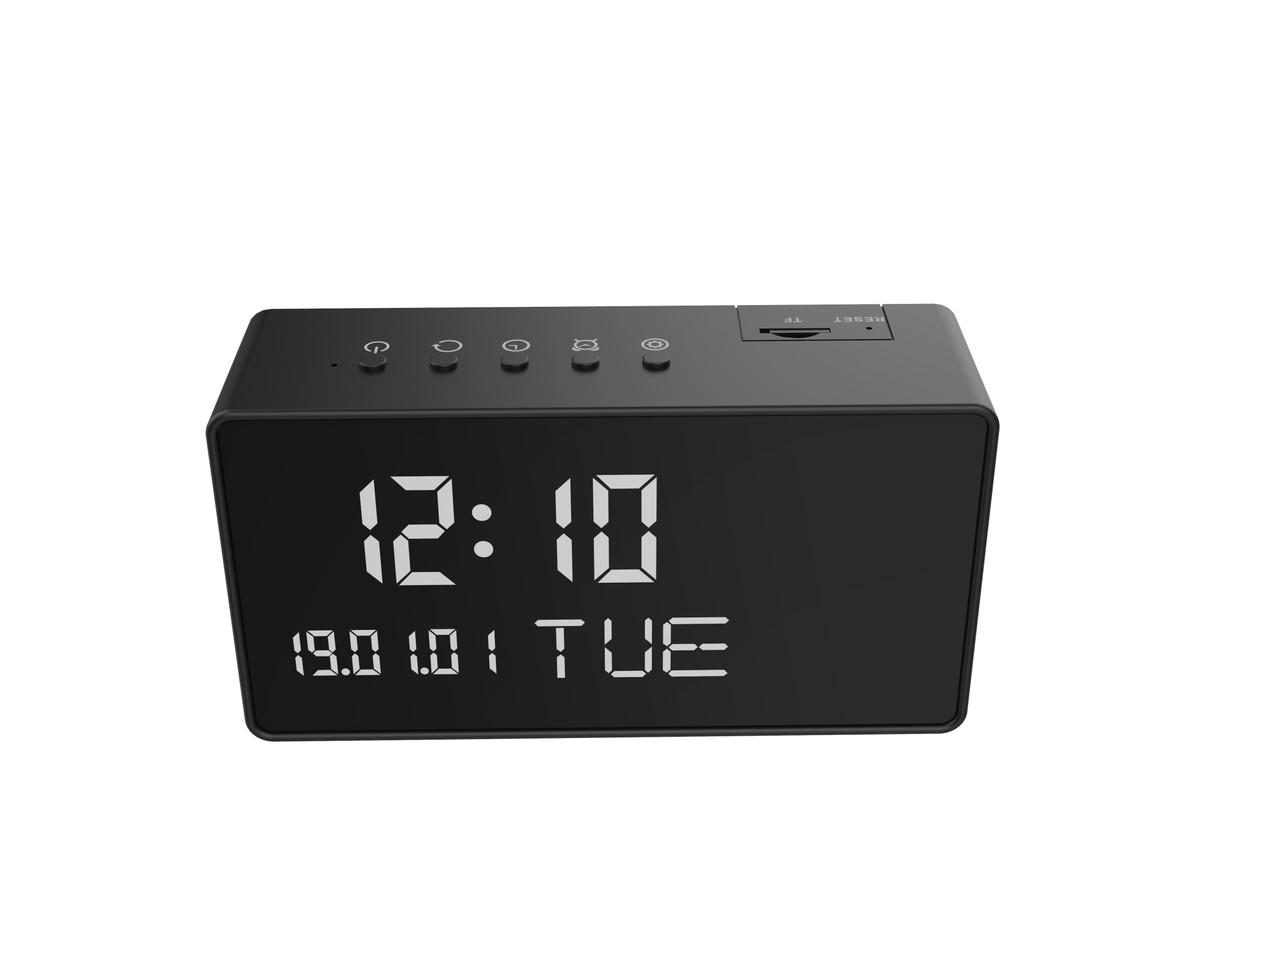 1080P HD Alarm Clock WiFi Camera With Night Vision